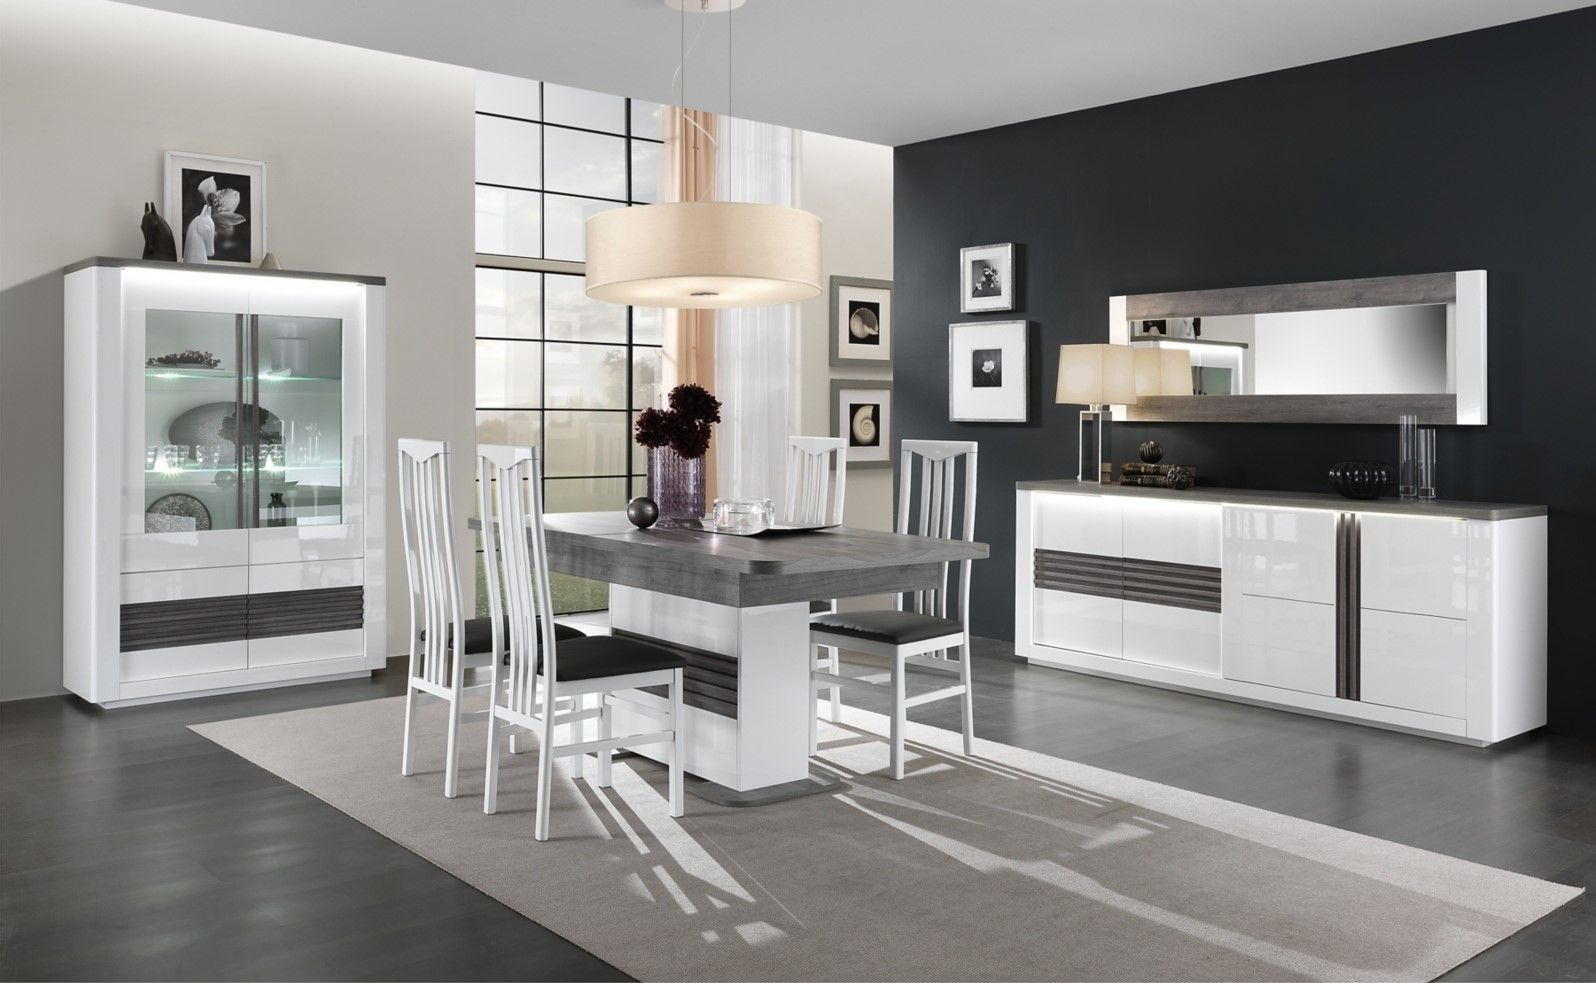 Table L180 + All Vertigo Blanc/Chêne Gris Pas Cher - Table intérieur Salle À Manger Vertigo